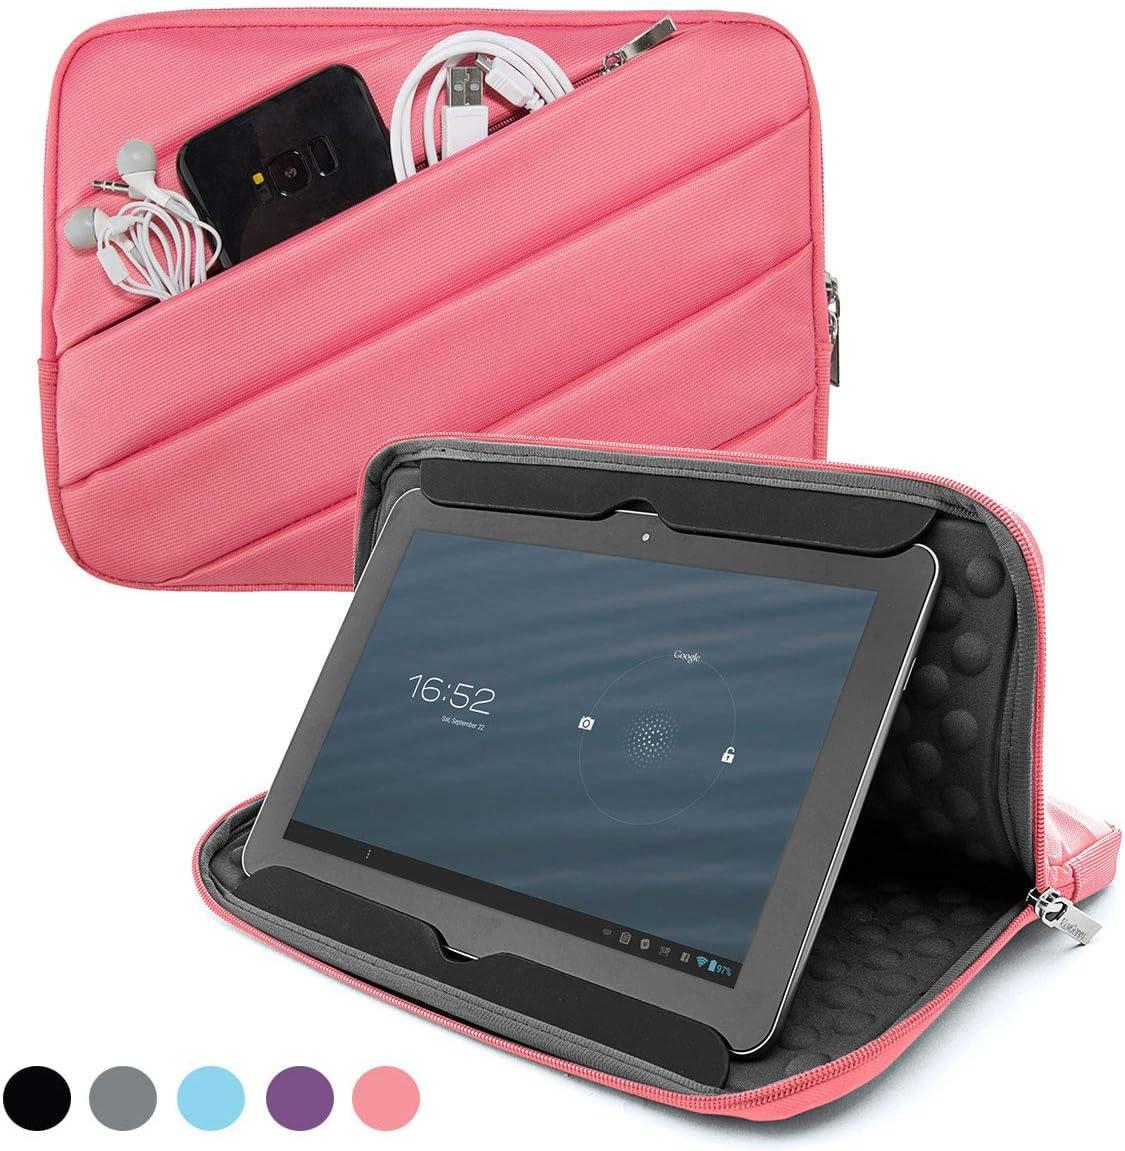 10 Inch Tablet Sleeve Case for Amazon Kindle Fire HD 10, Fire HD 8, Fire 7, Samsung Galaxy Tab A 10.1, Tab E 9.6, Lenovo Tab 4, New Microsoft Surface Go